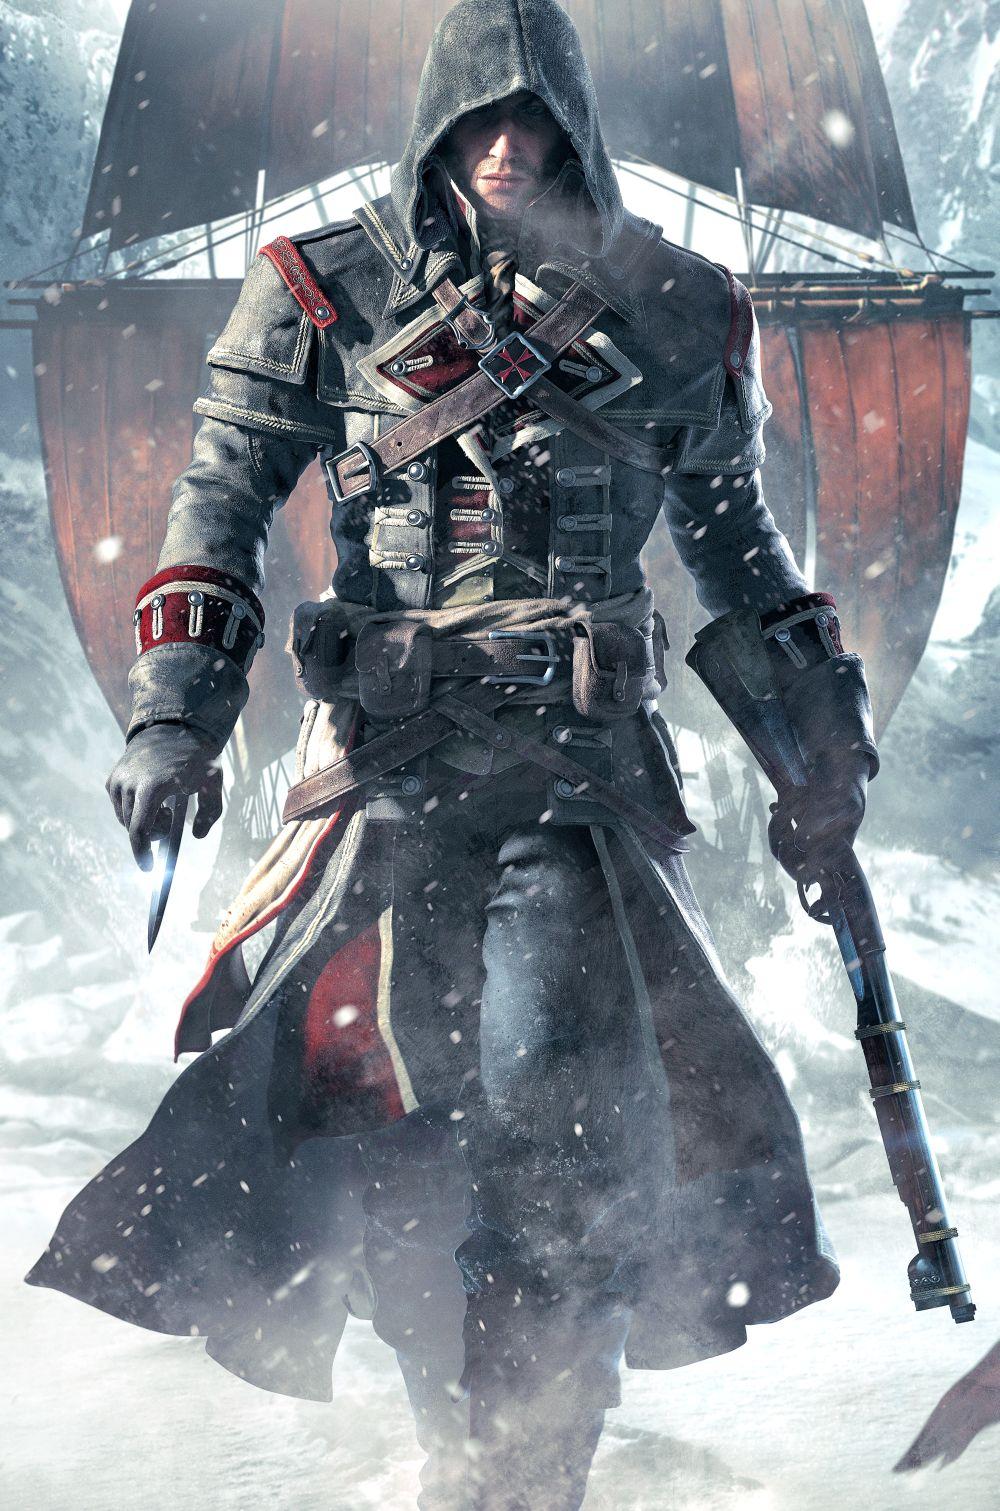 Assassins Creed Rogue Puts You Behind The Ships Wheel Again This Fall VG247